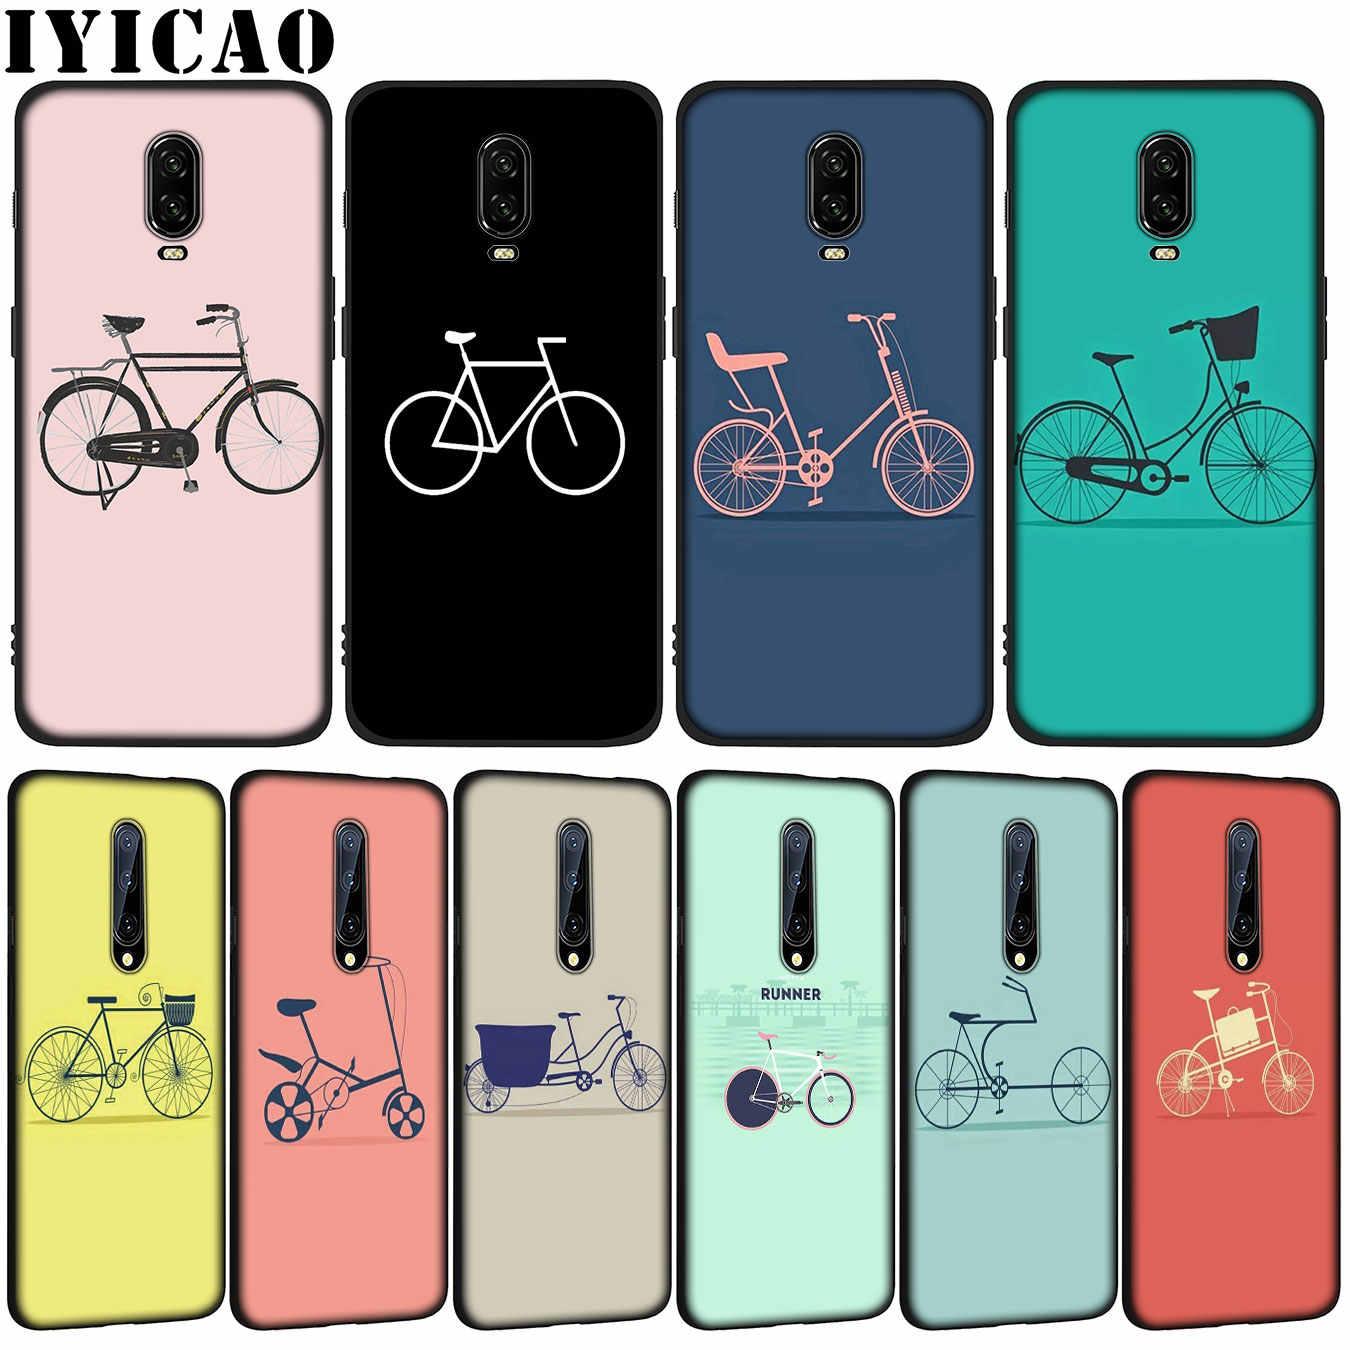 Funda de teléfono de silicona negra TPU suave para bicicleta con figura de palo para OnePlus 7T 7 Pro 6 6T 5 5T One Plus 7Pro